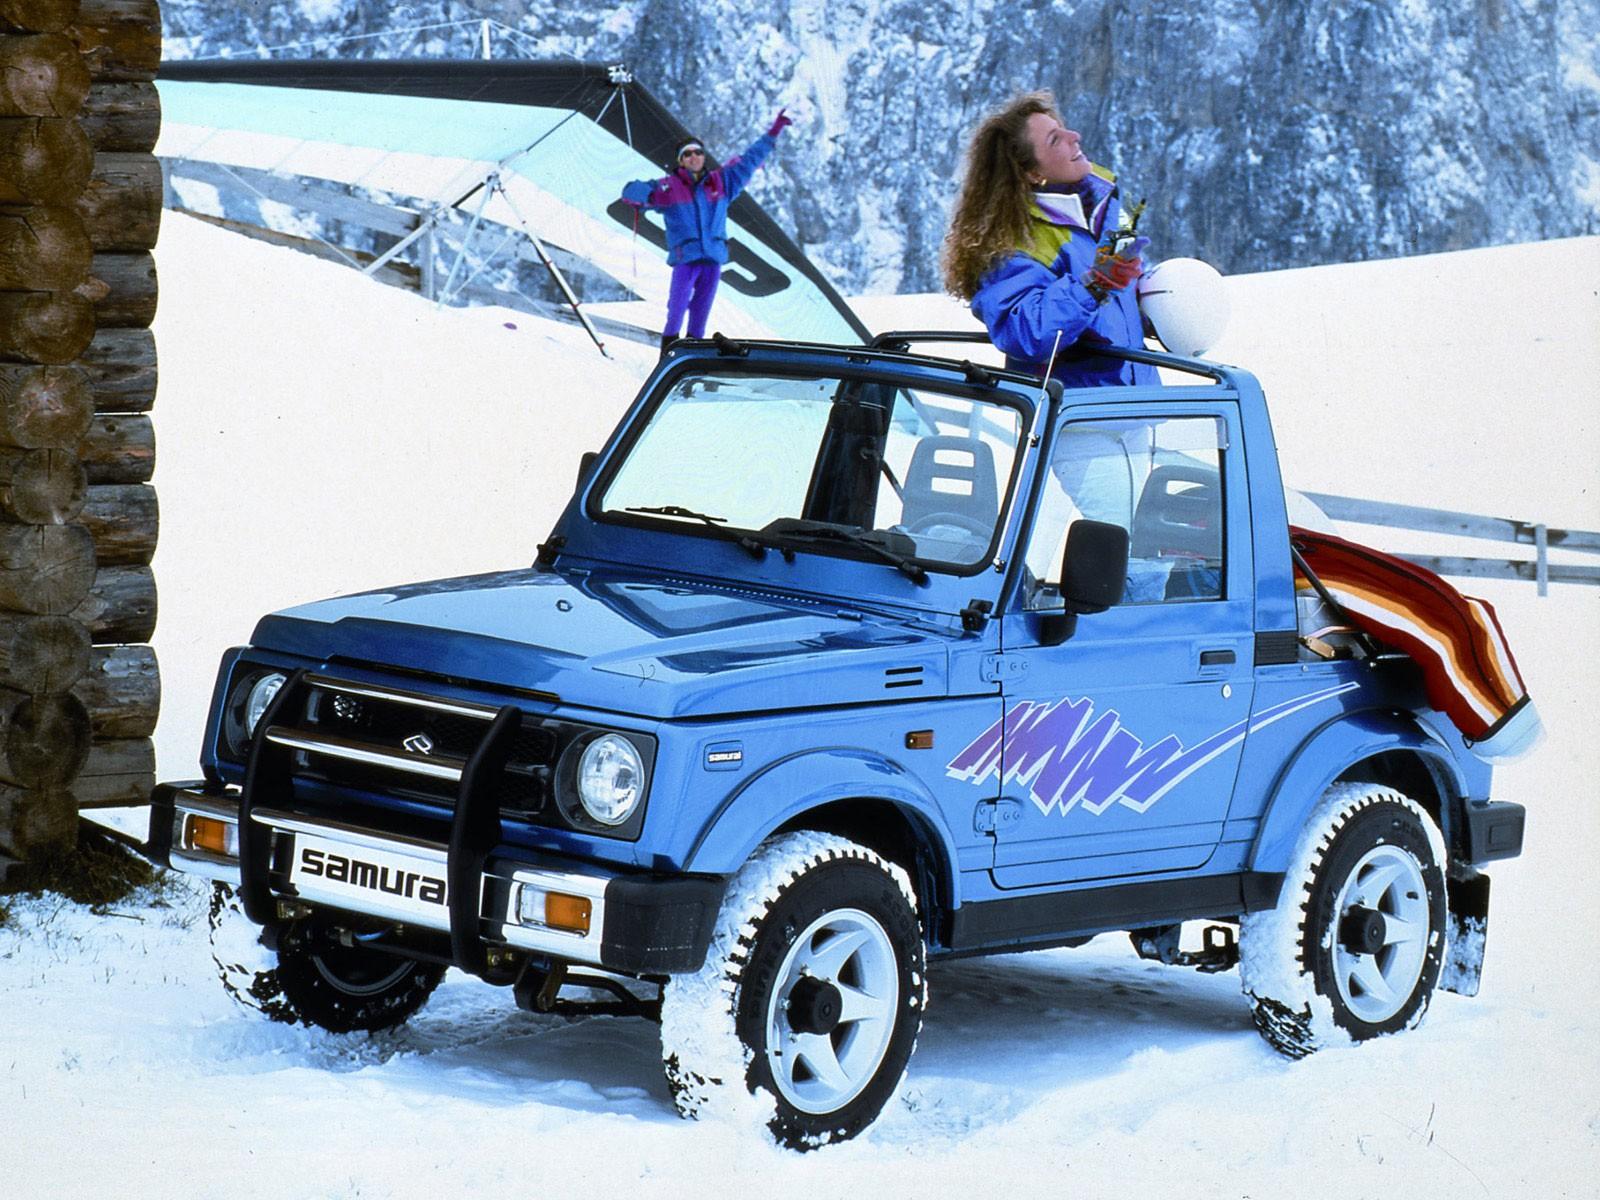 cabriolet l'hiver